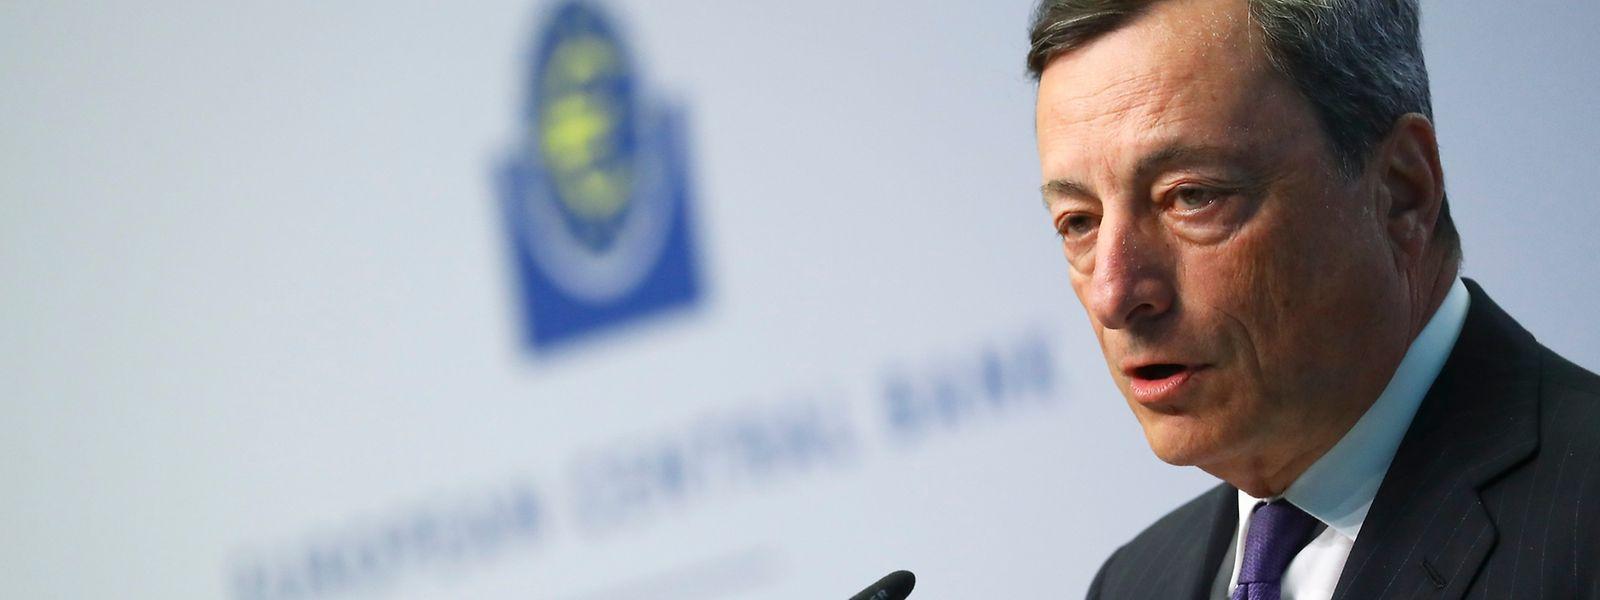 Draghi hält an seiner Geldpolitik fest.